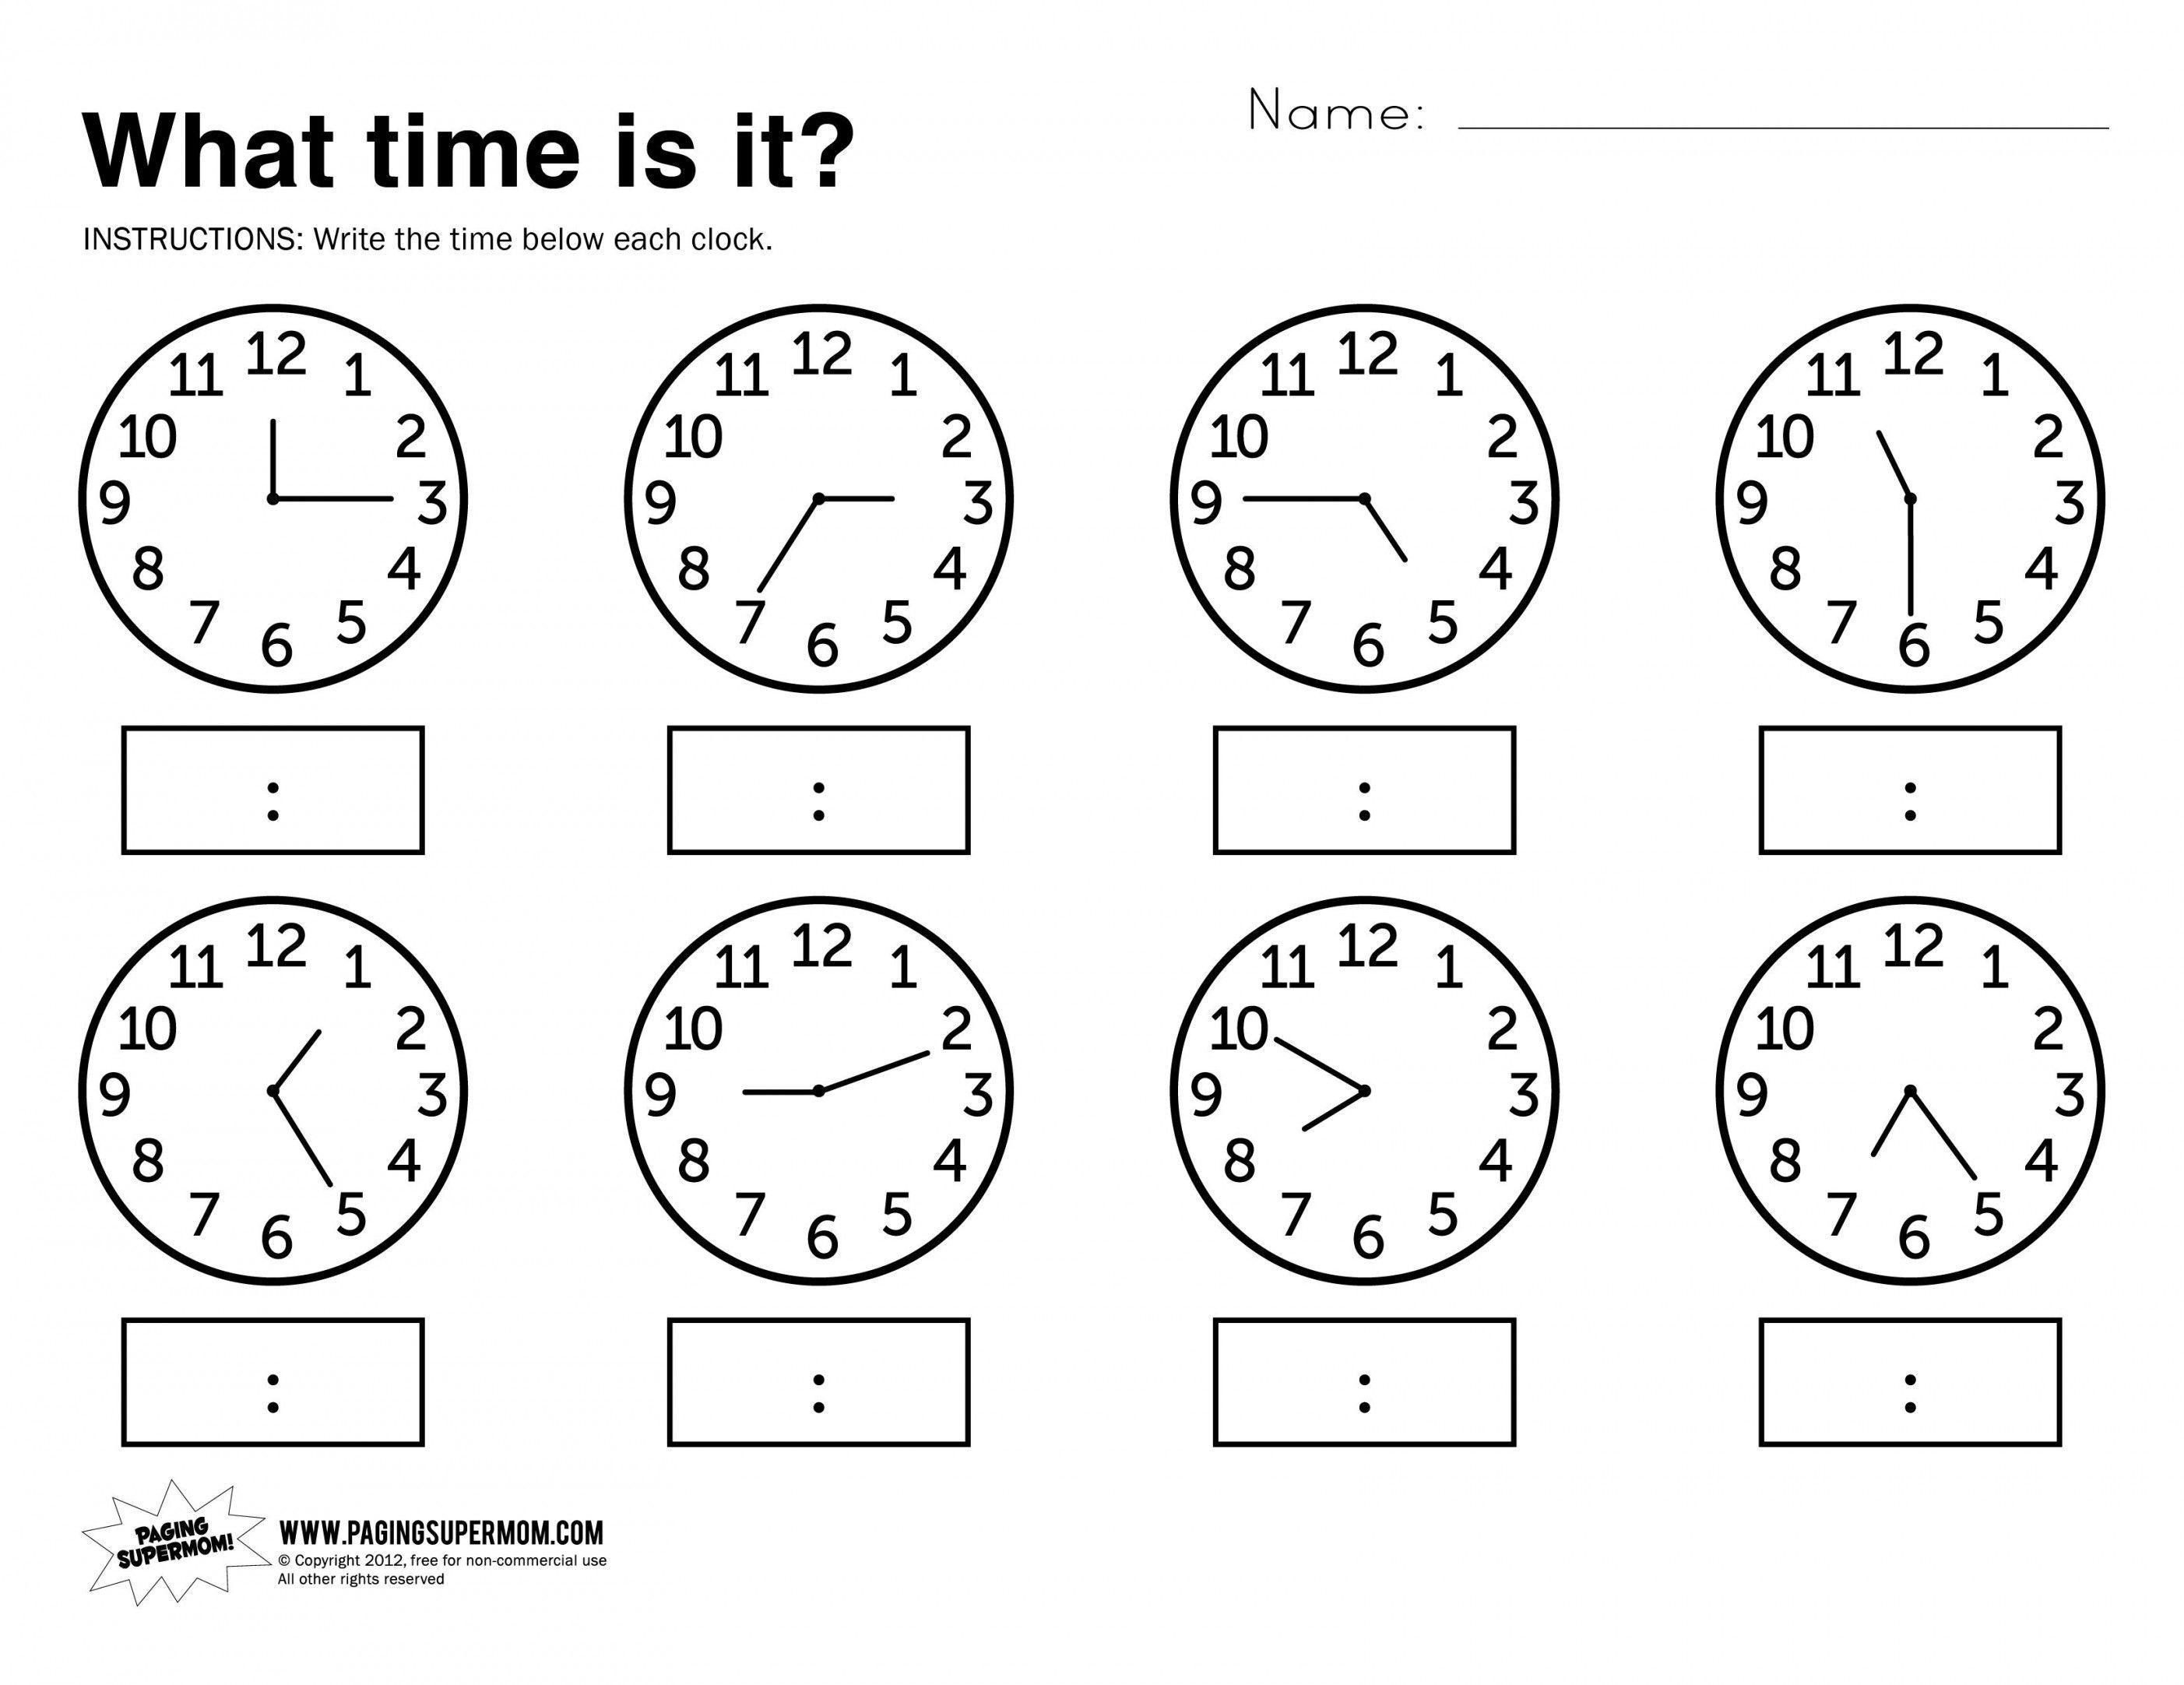 Telling Time Worksheets Grade 3 | Lostranquillos - Free Printable | Free Printable Elapsed Time Worksheets For Grade 3